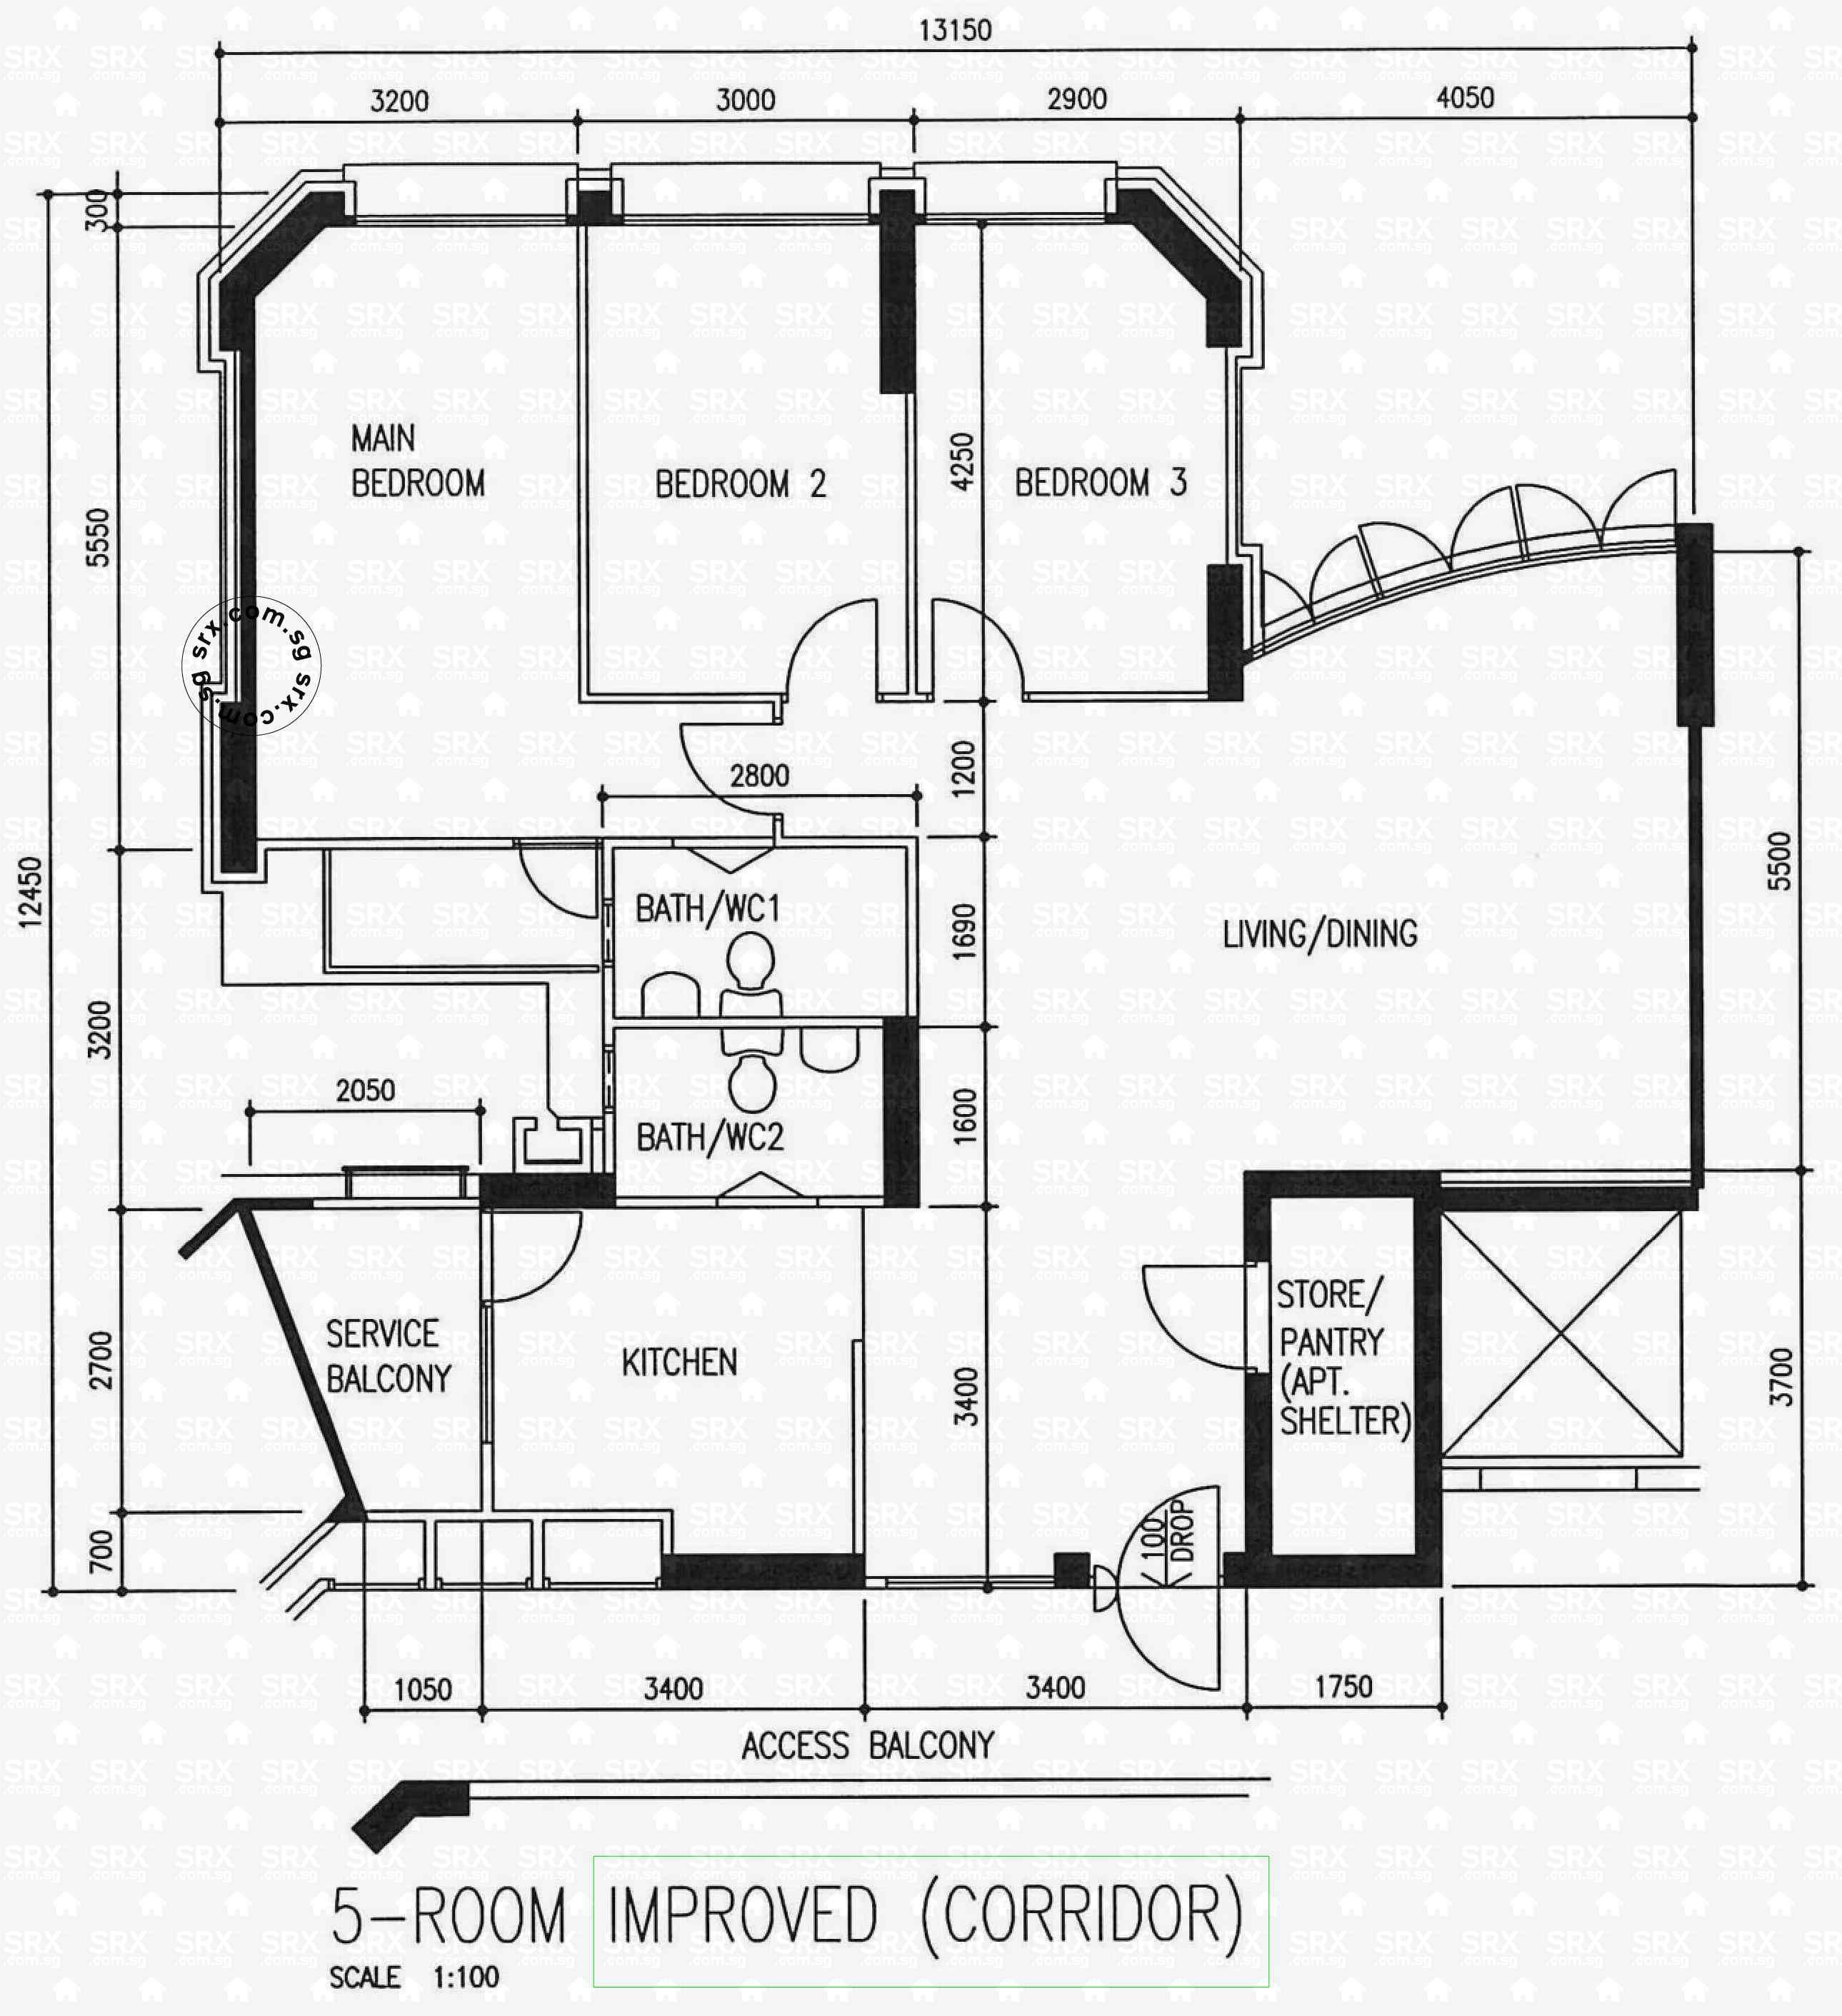 hougang street 52 hdb details srx property hougang street 51 hdb details srx property